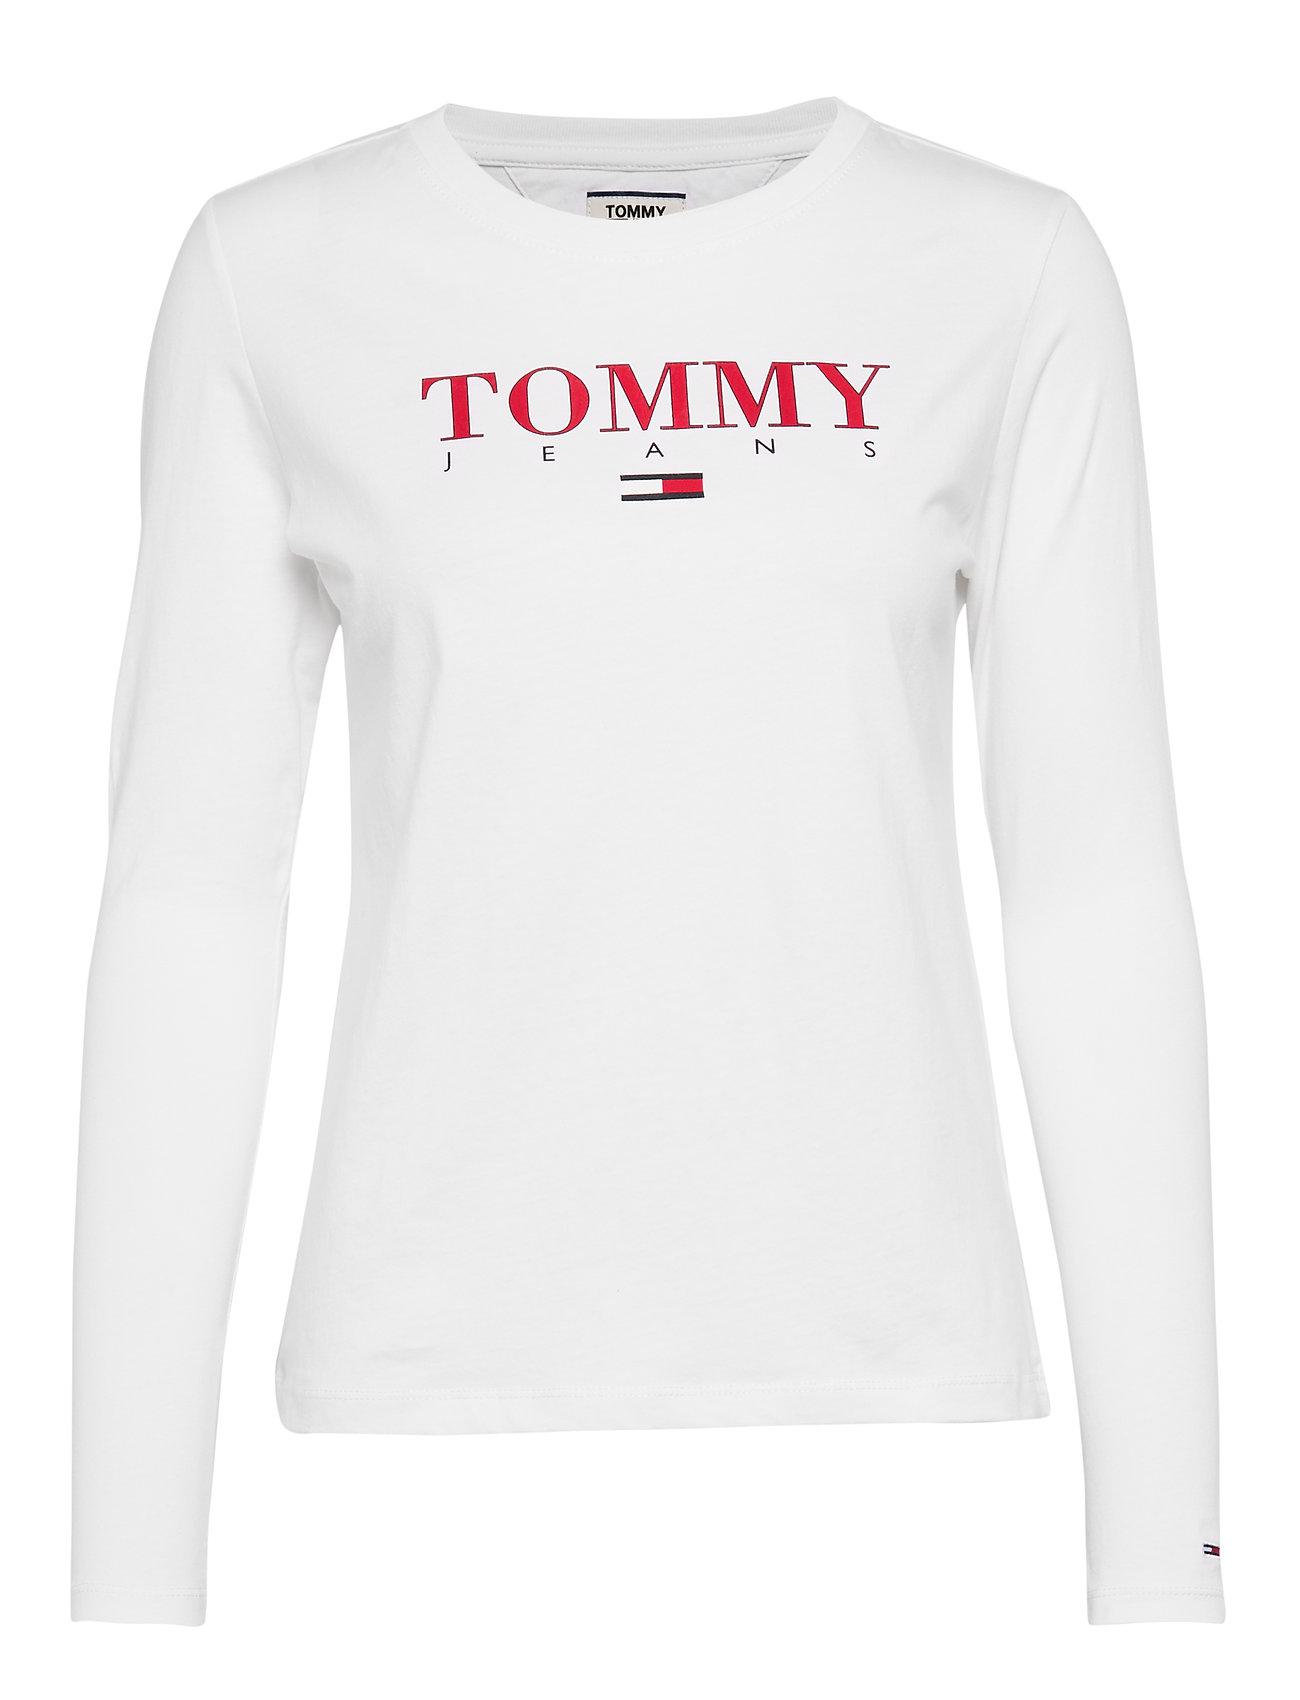 Tommy Jeans TJW ESSENTIAL LOGO LONGSLEEVE - CLASSIC WHITE